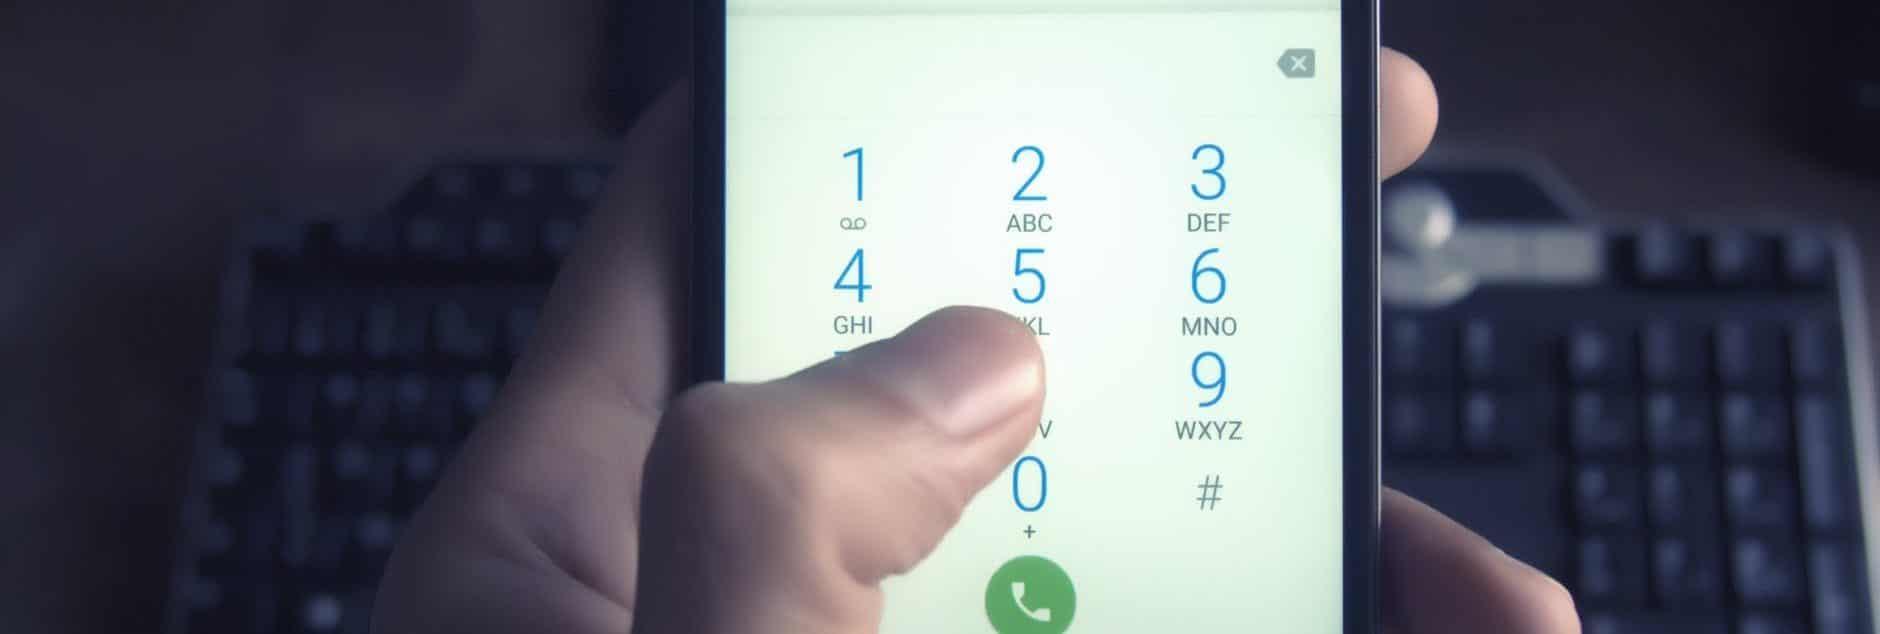 Cloud Based Auto Dialer Solutions | Auto Dialer | Call Logic